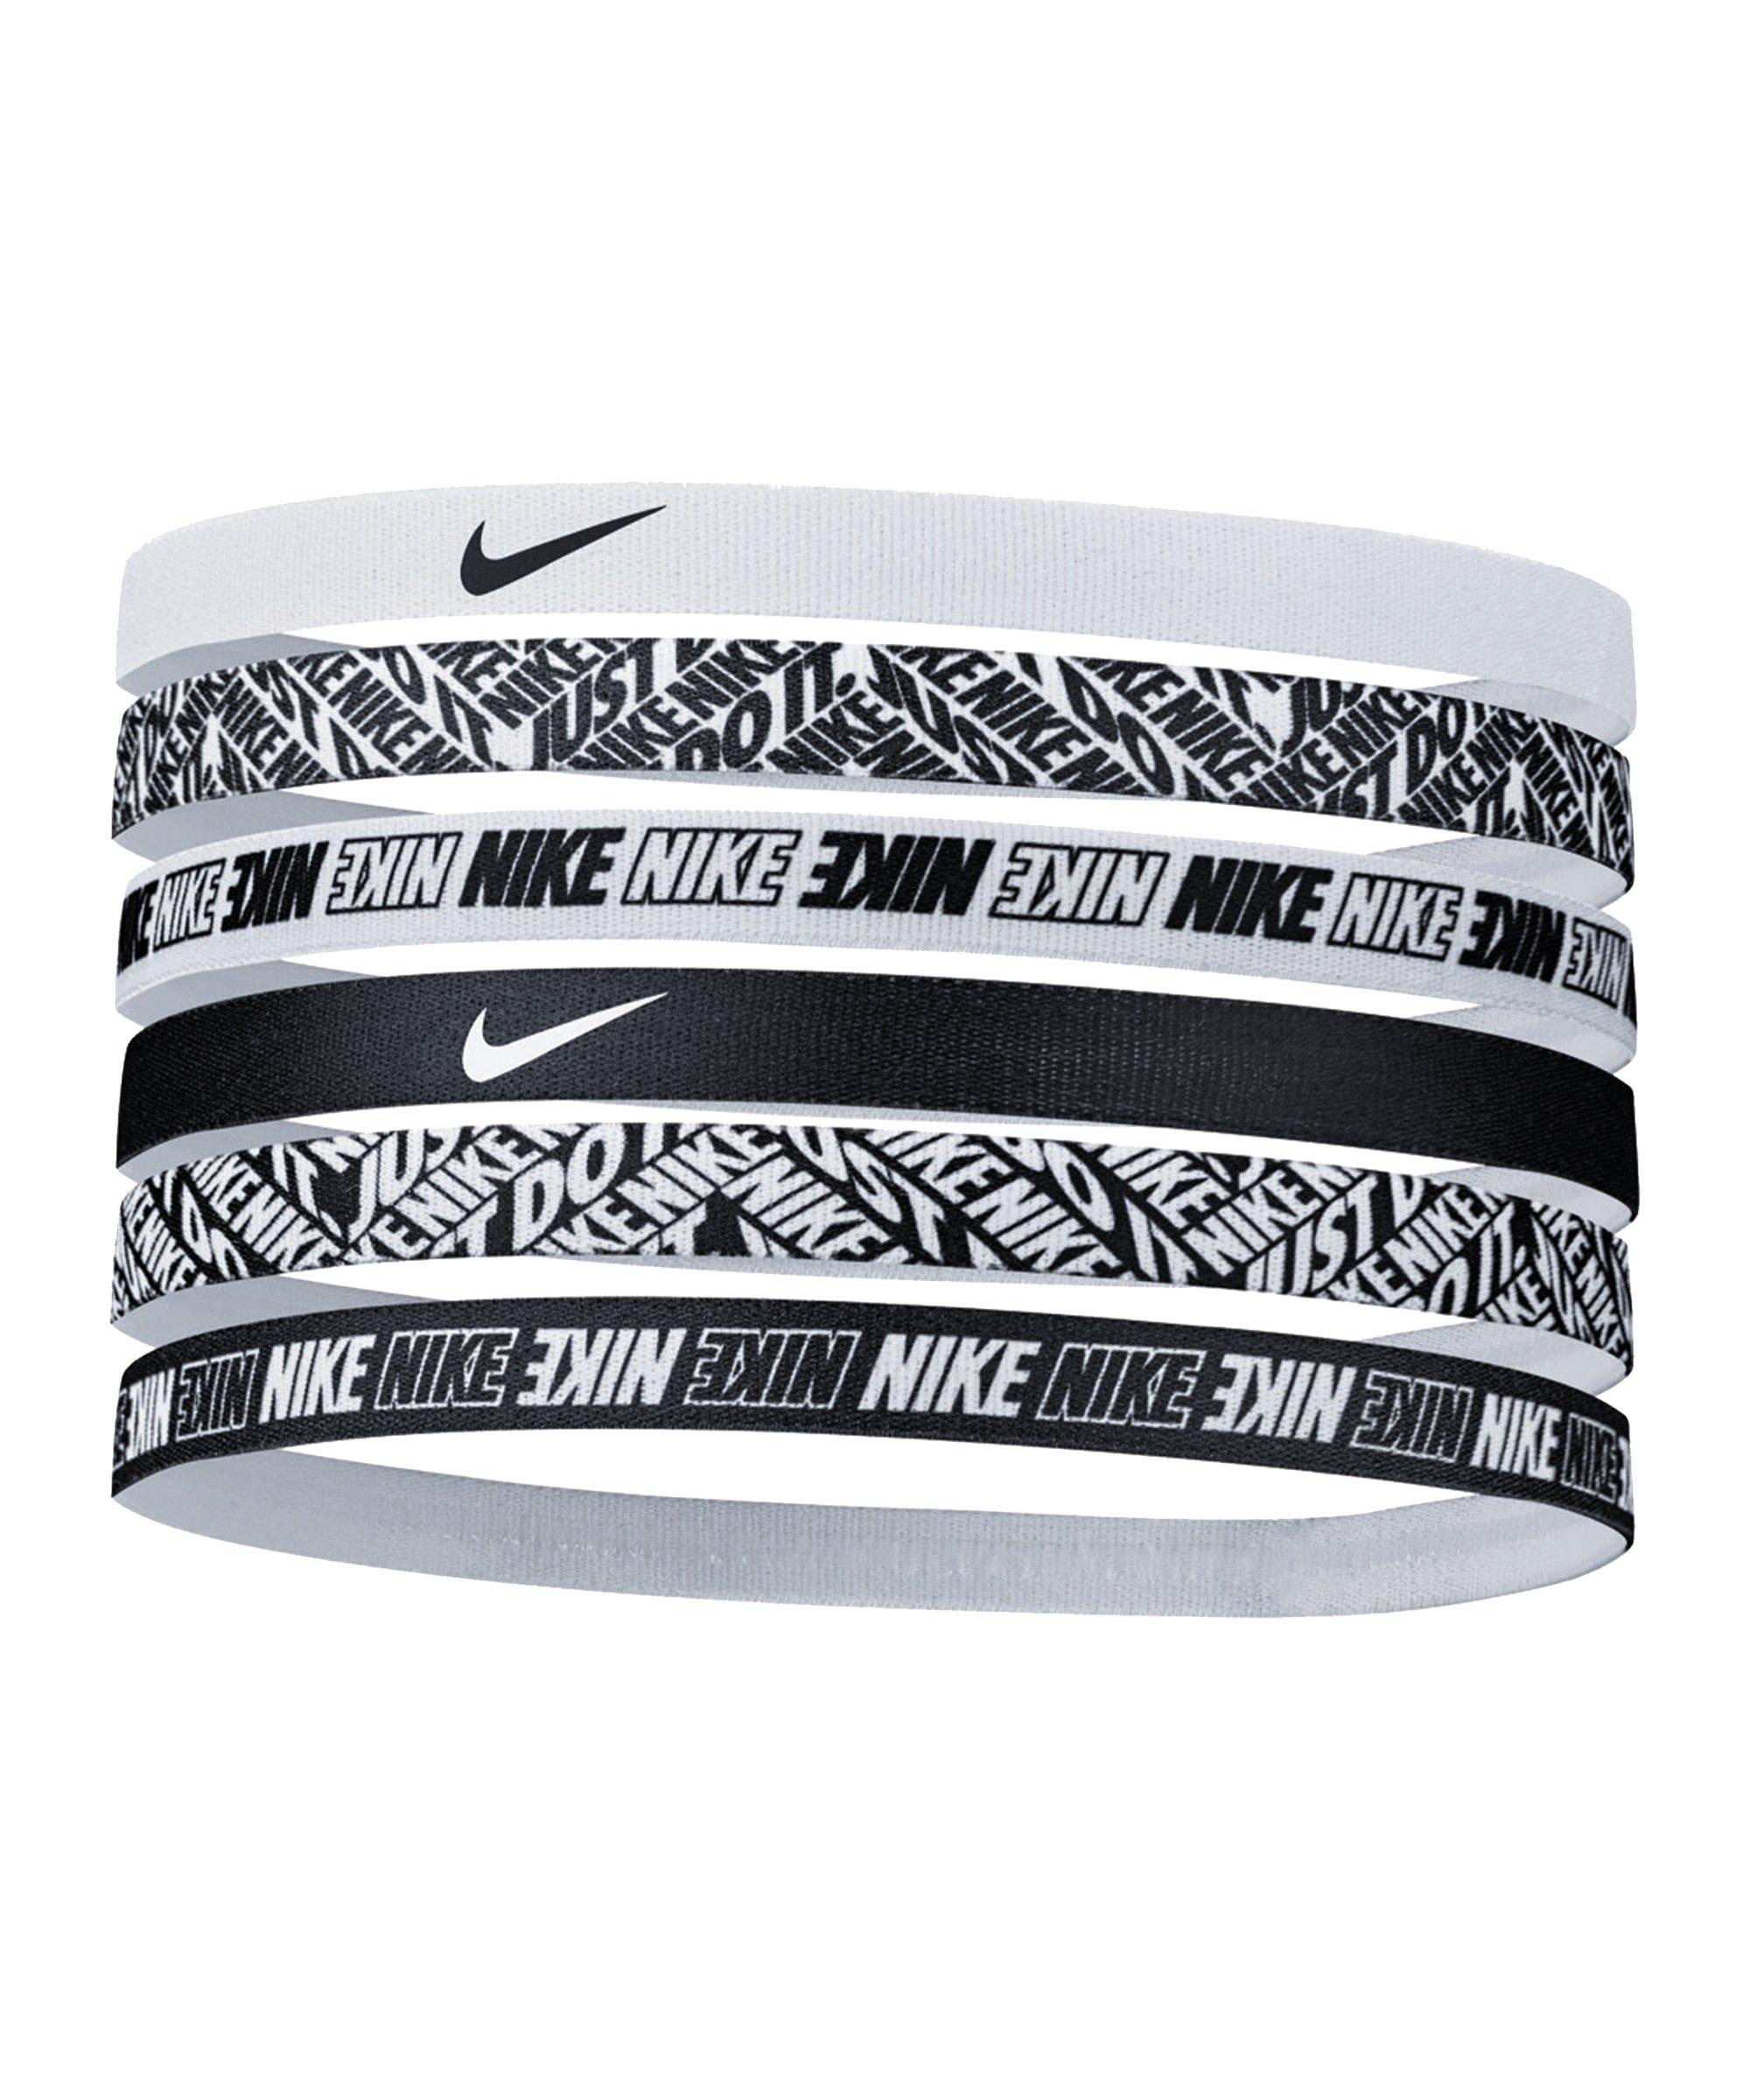 Nike Printed Stirnbänder 6er Pack F176 - weiss